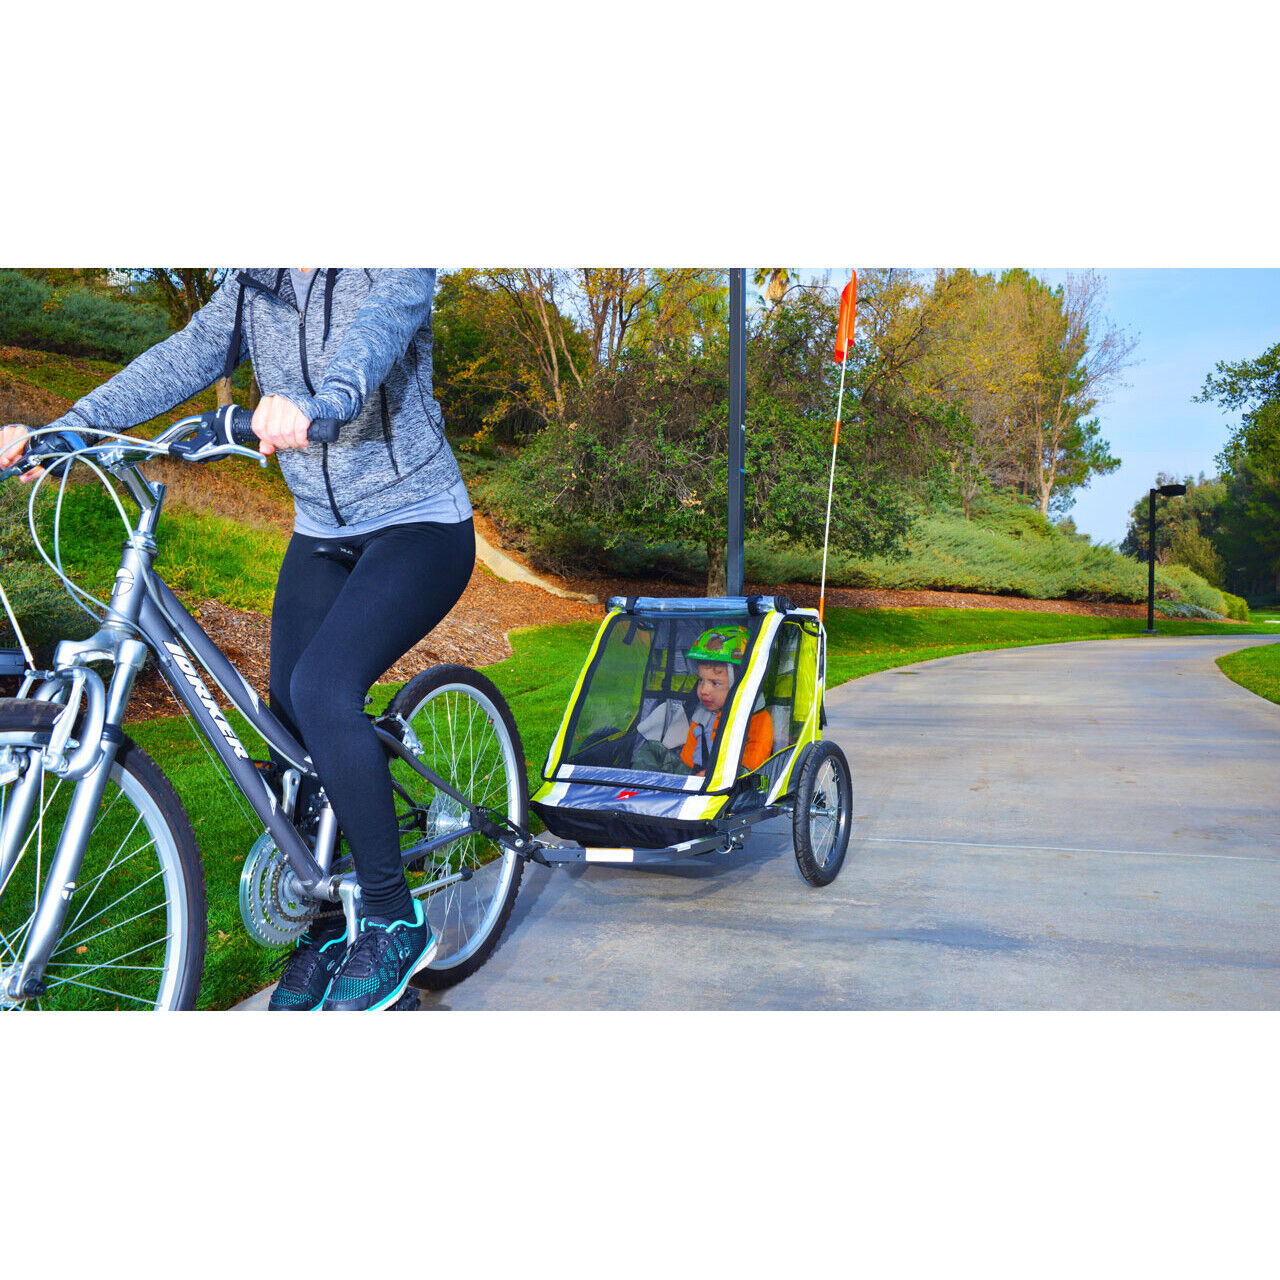 2 Child Bike Trailer Sports Deluxe Lightweight Steel Constru